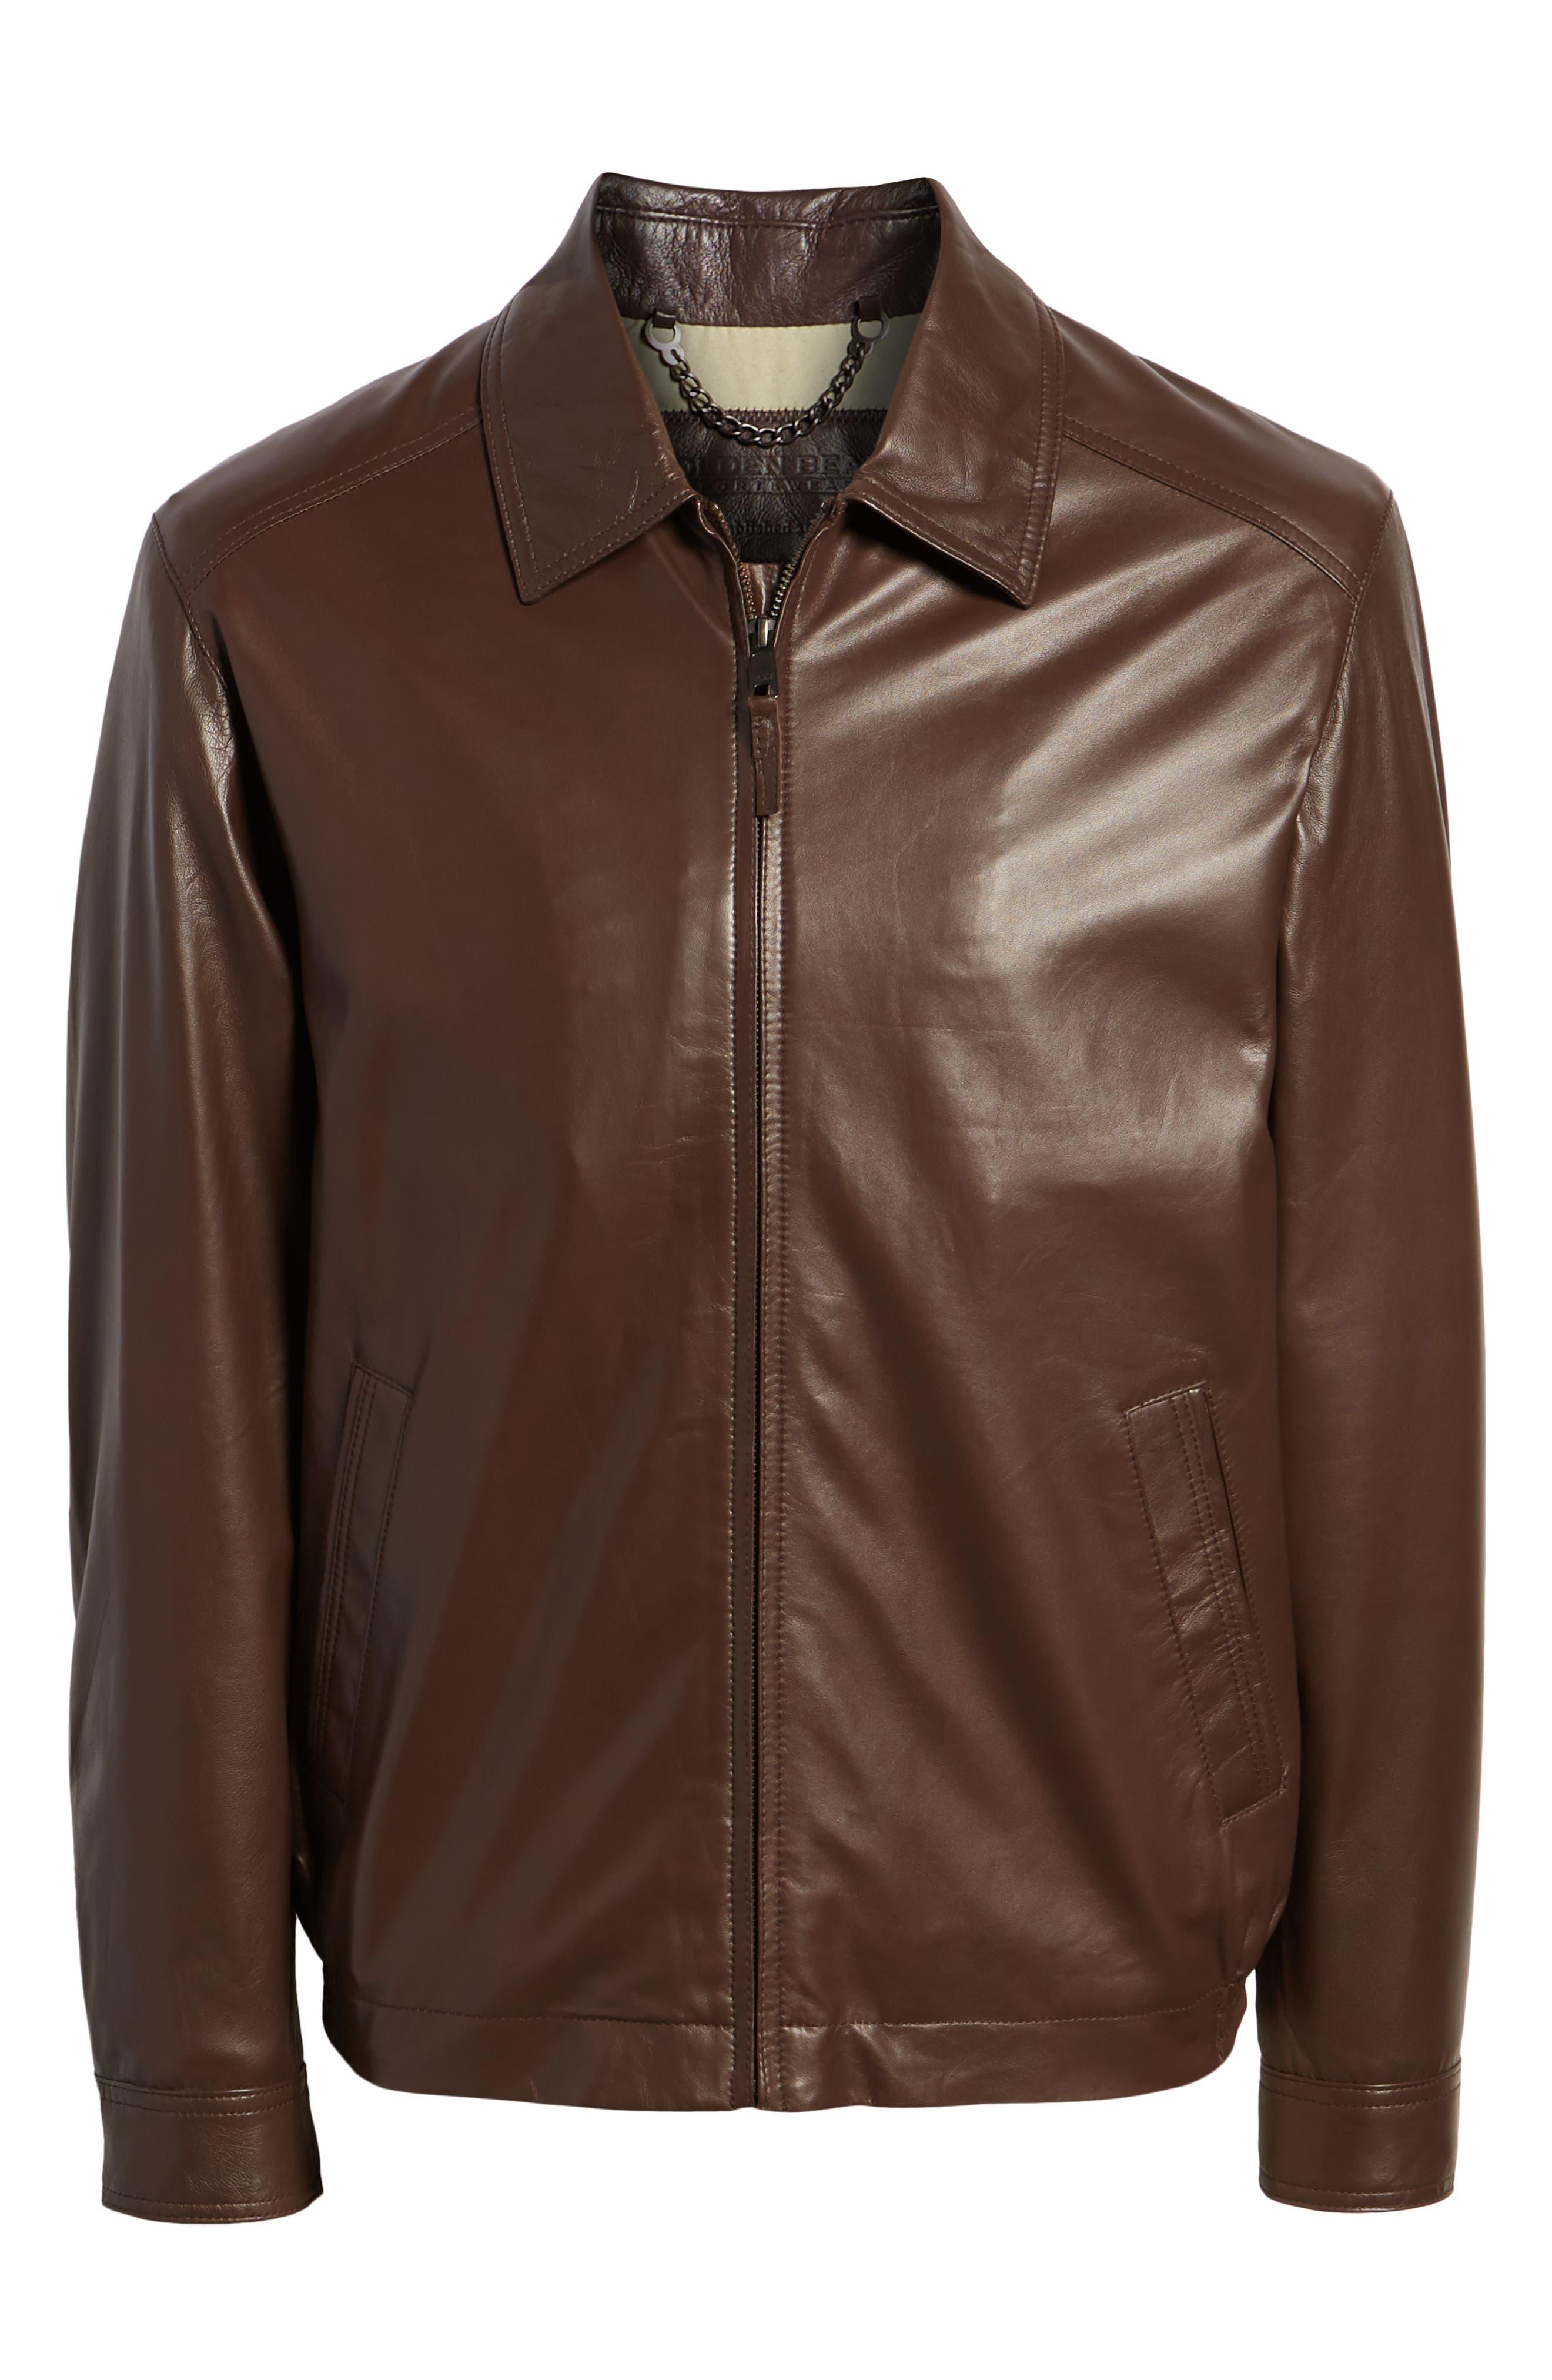 GOLDEN BEAR,                             The Bartlett Leather Jacket,                             Alternate thumbnail 6, color,                             DARK BROWN